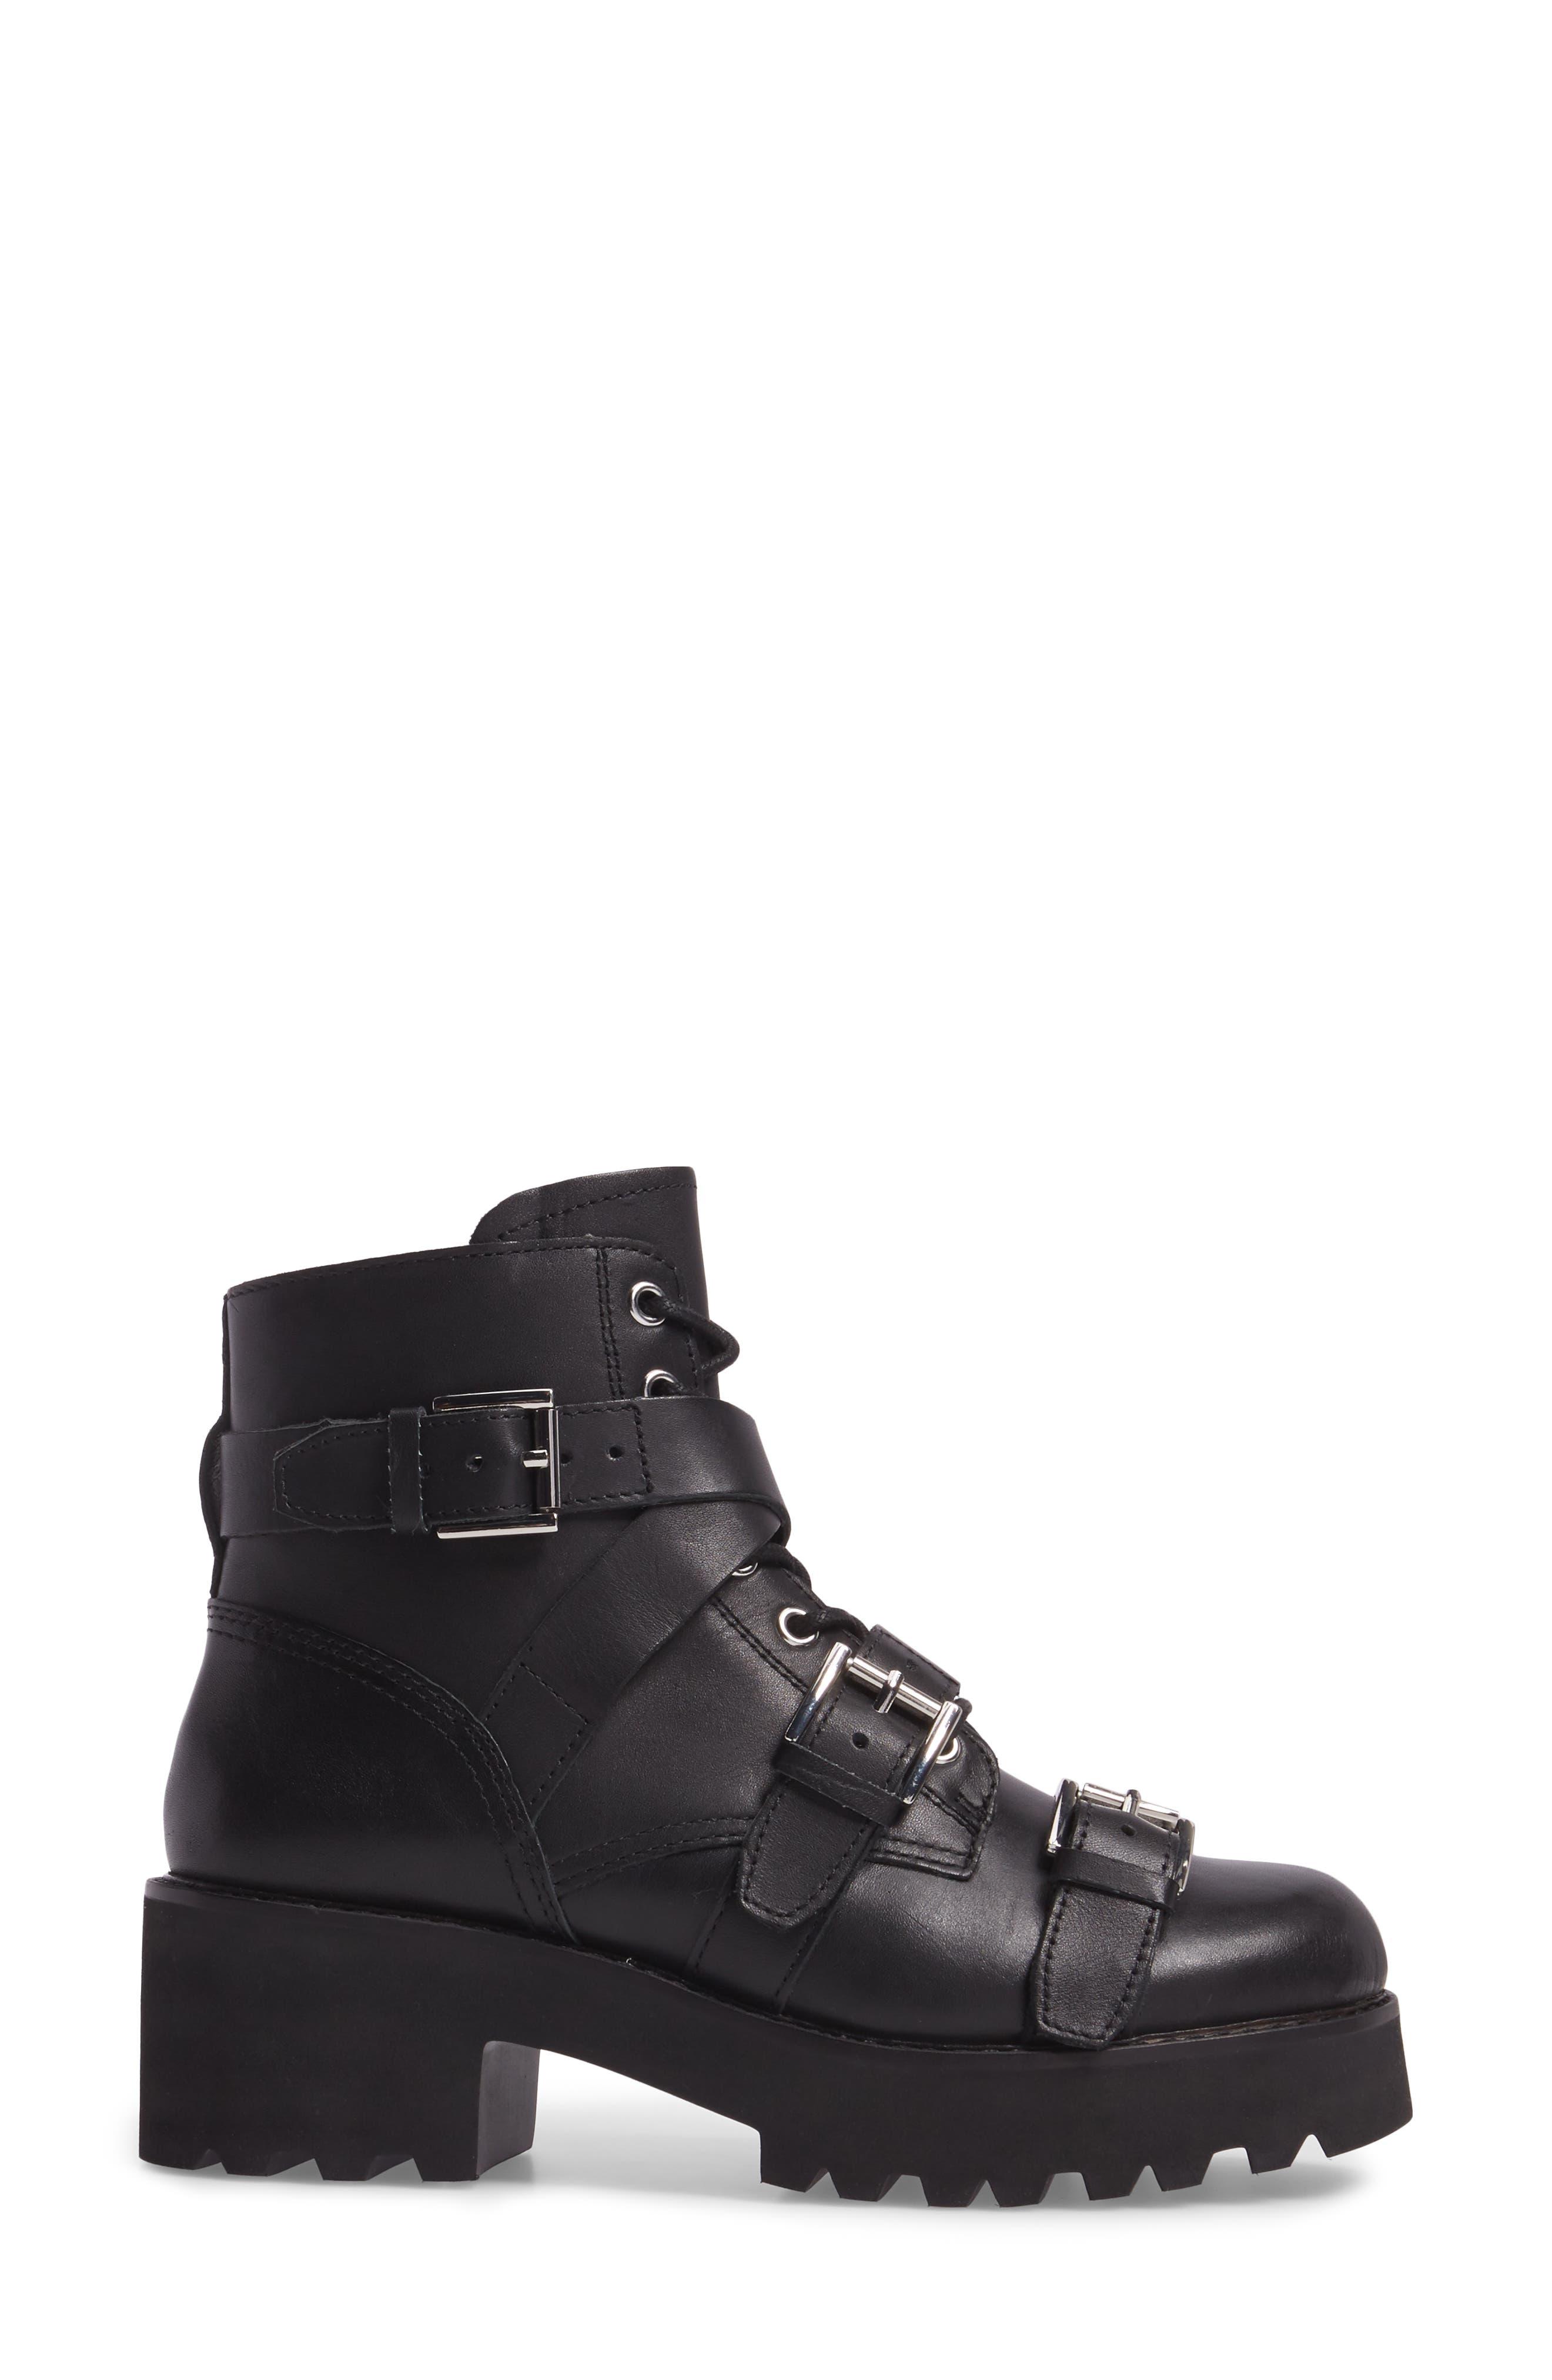 Razor Bootie,                             Alternate thumbnail 3, color,                             Black Leather